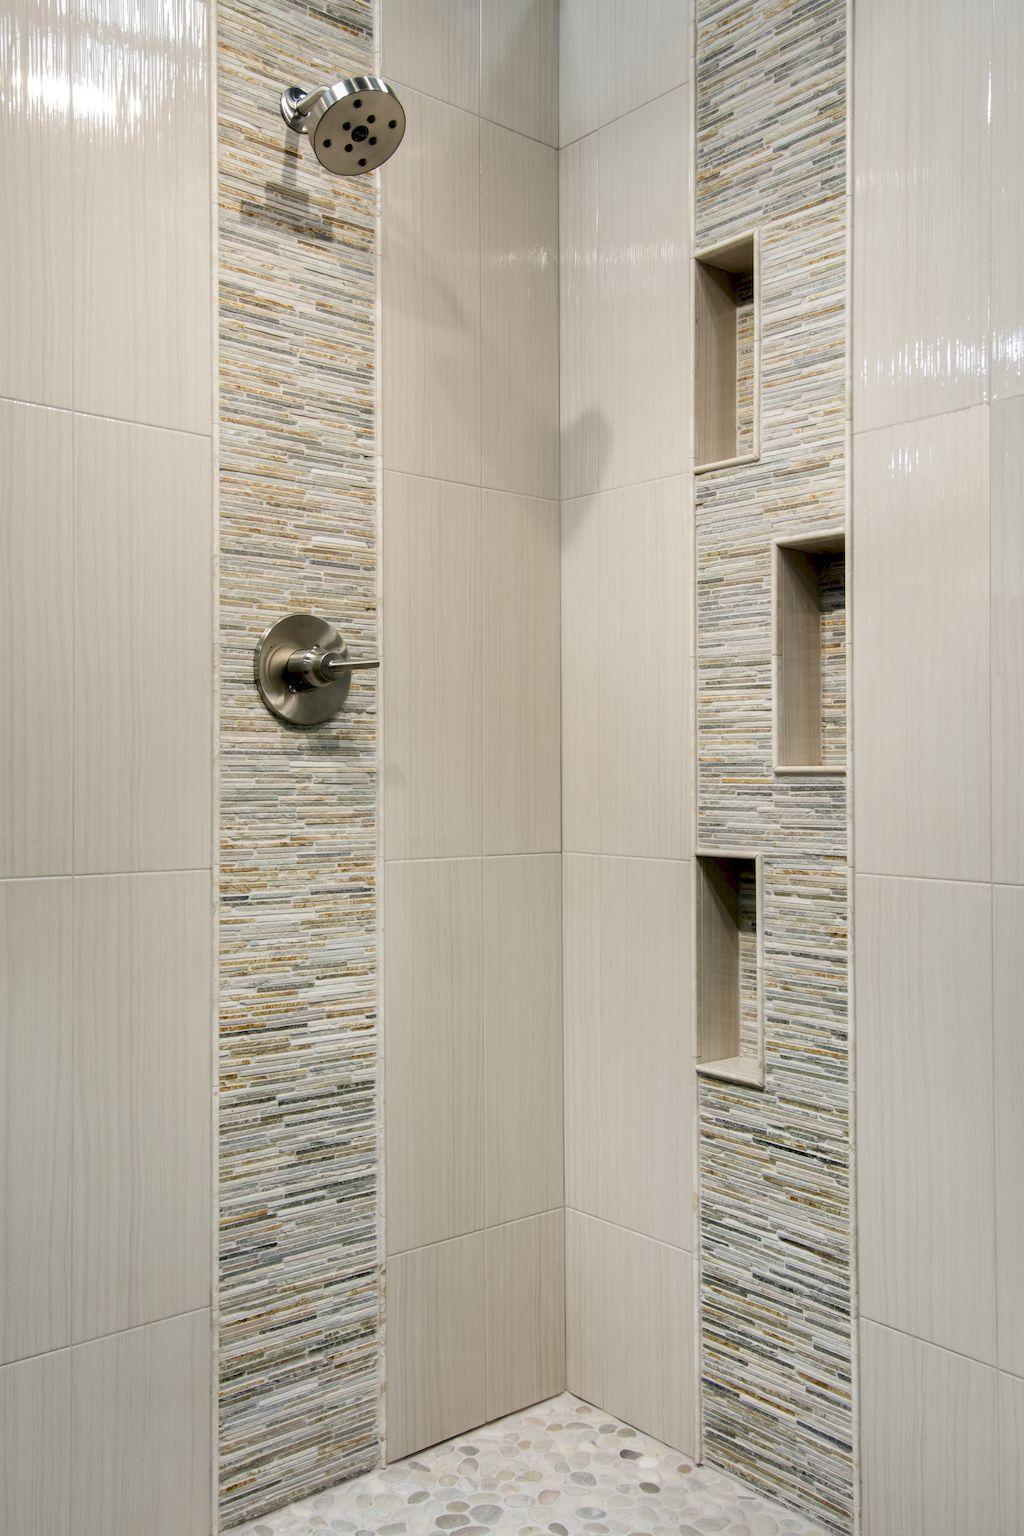 50 Beautiful Bathroom Shower Tile Ideas 39 Bathroomrenovations Small Bathroom Tiles Master Bathroom Shower Tile Bathroom